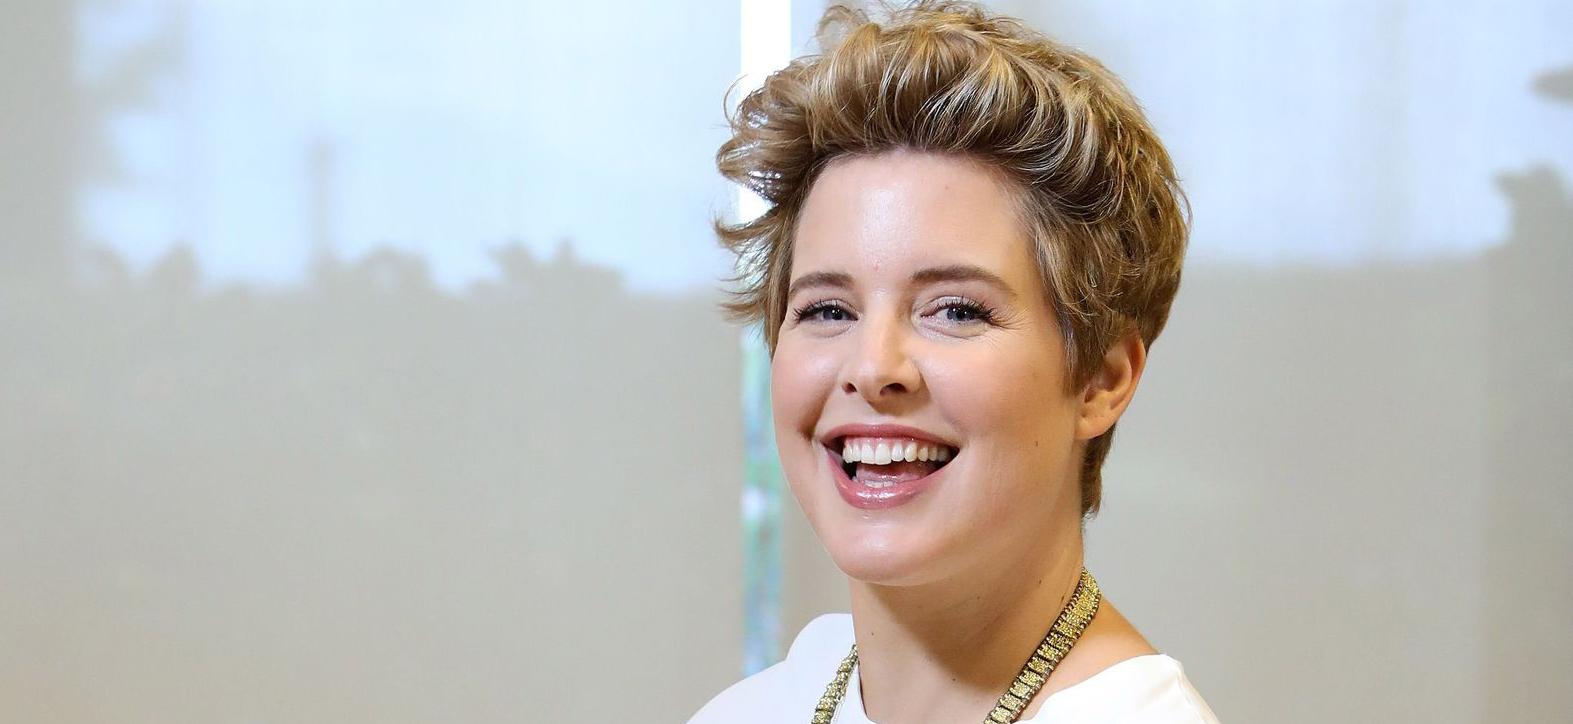 Tania Llasera, en una foto promocional - Europa Press